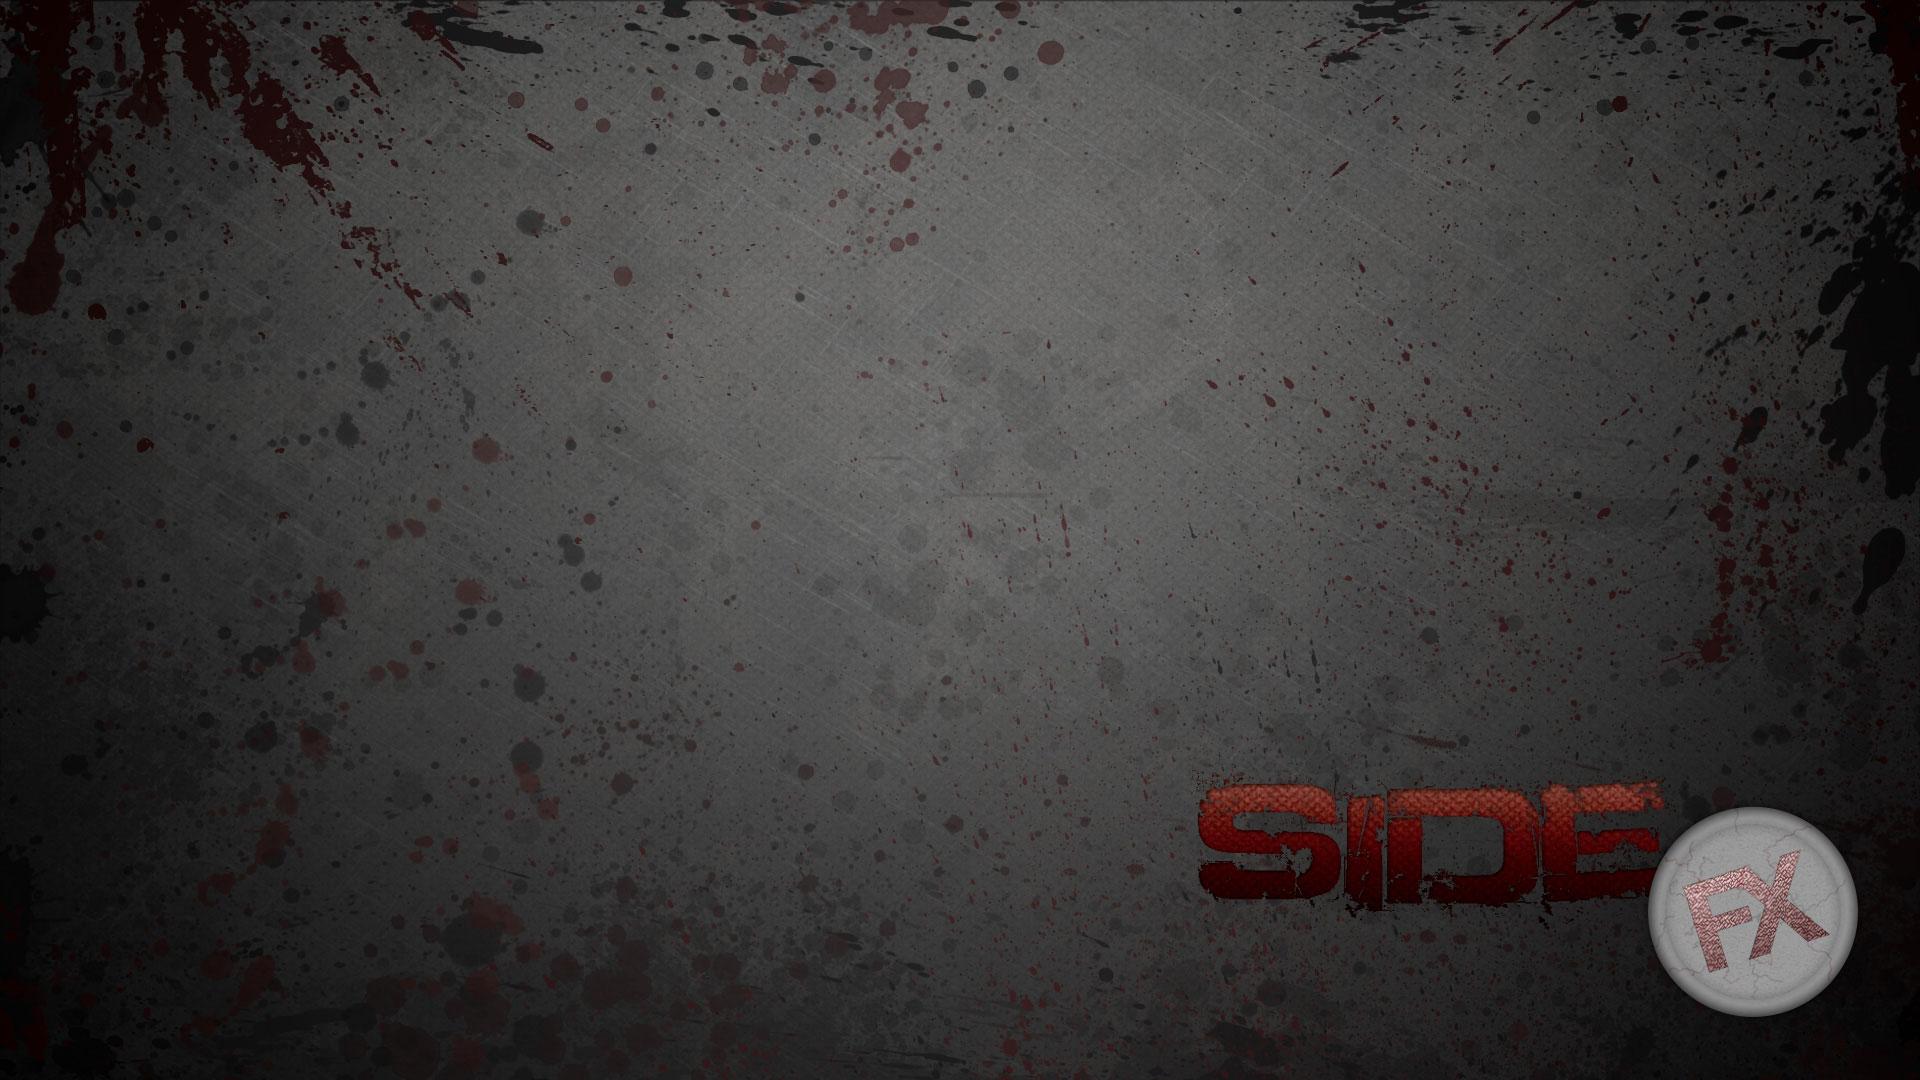 sidefx_1